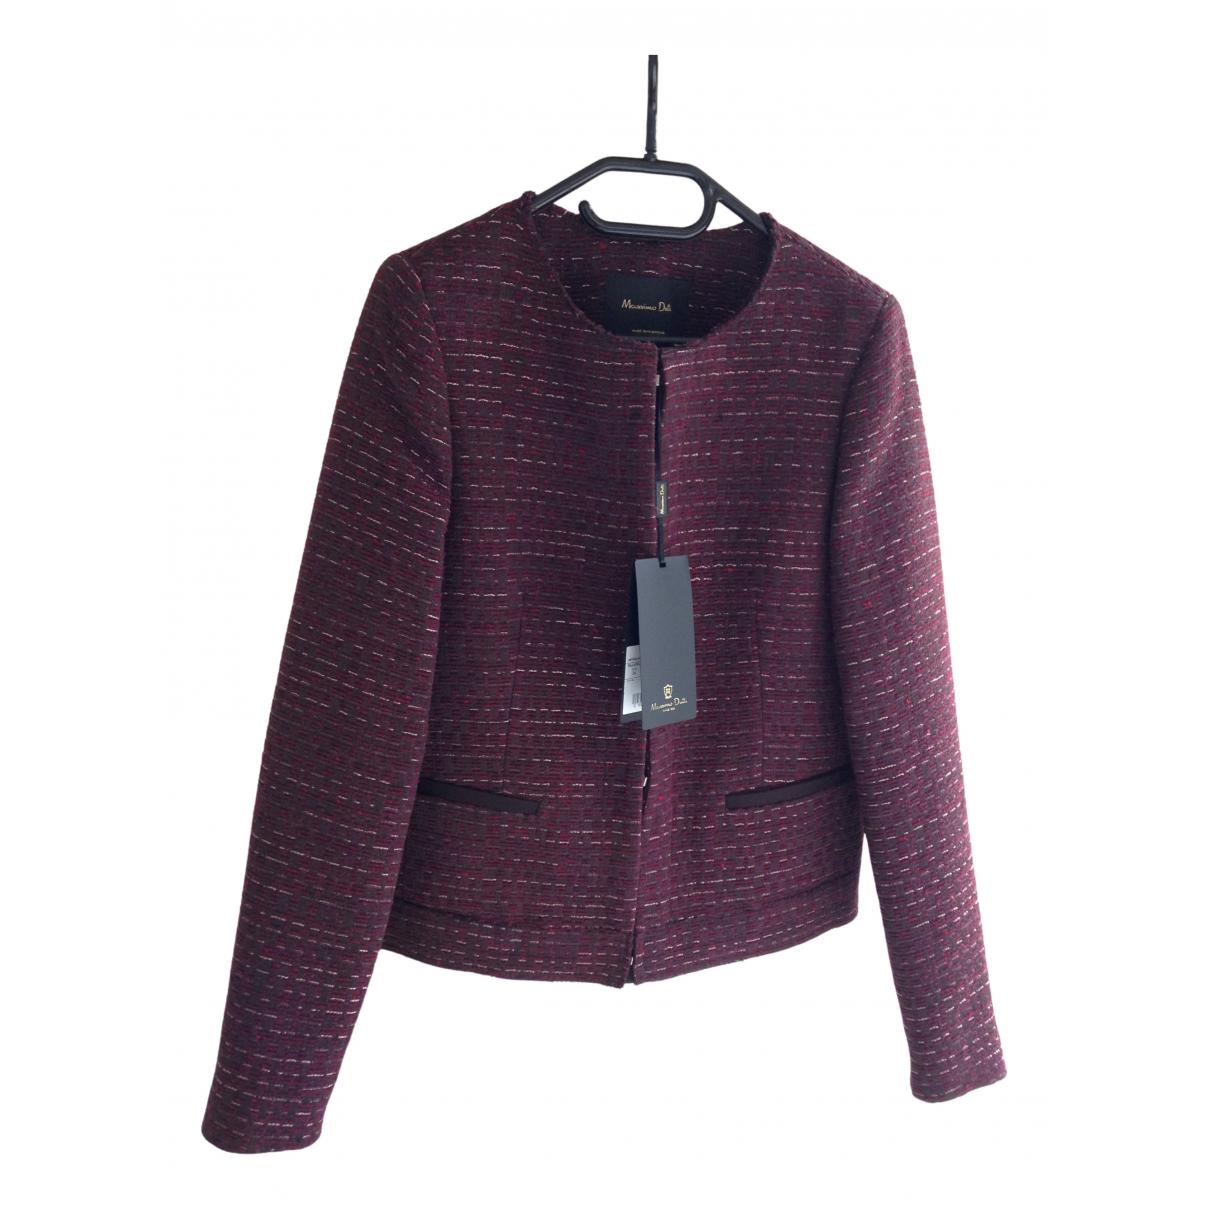 Massimo Dutti \N Burgundy Cotton jacket for Women XS International